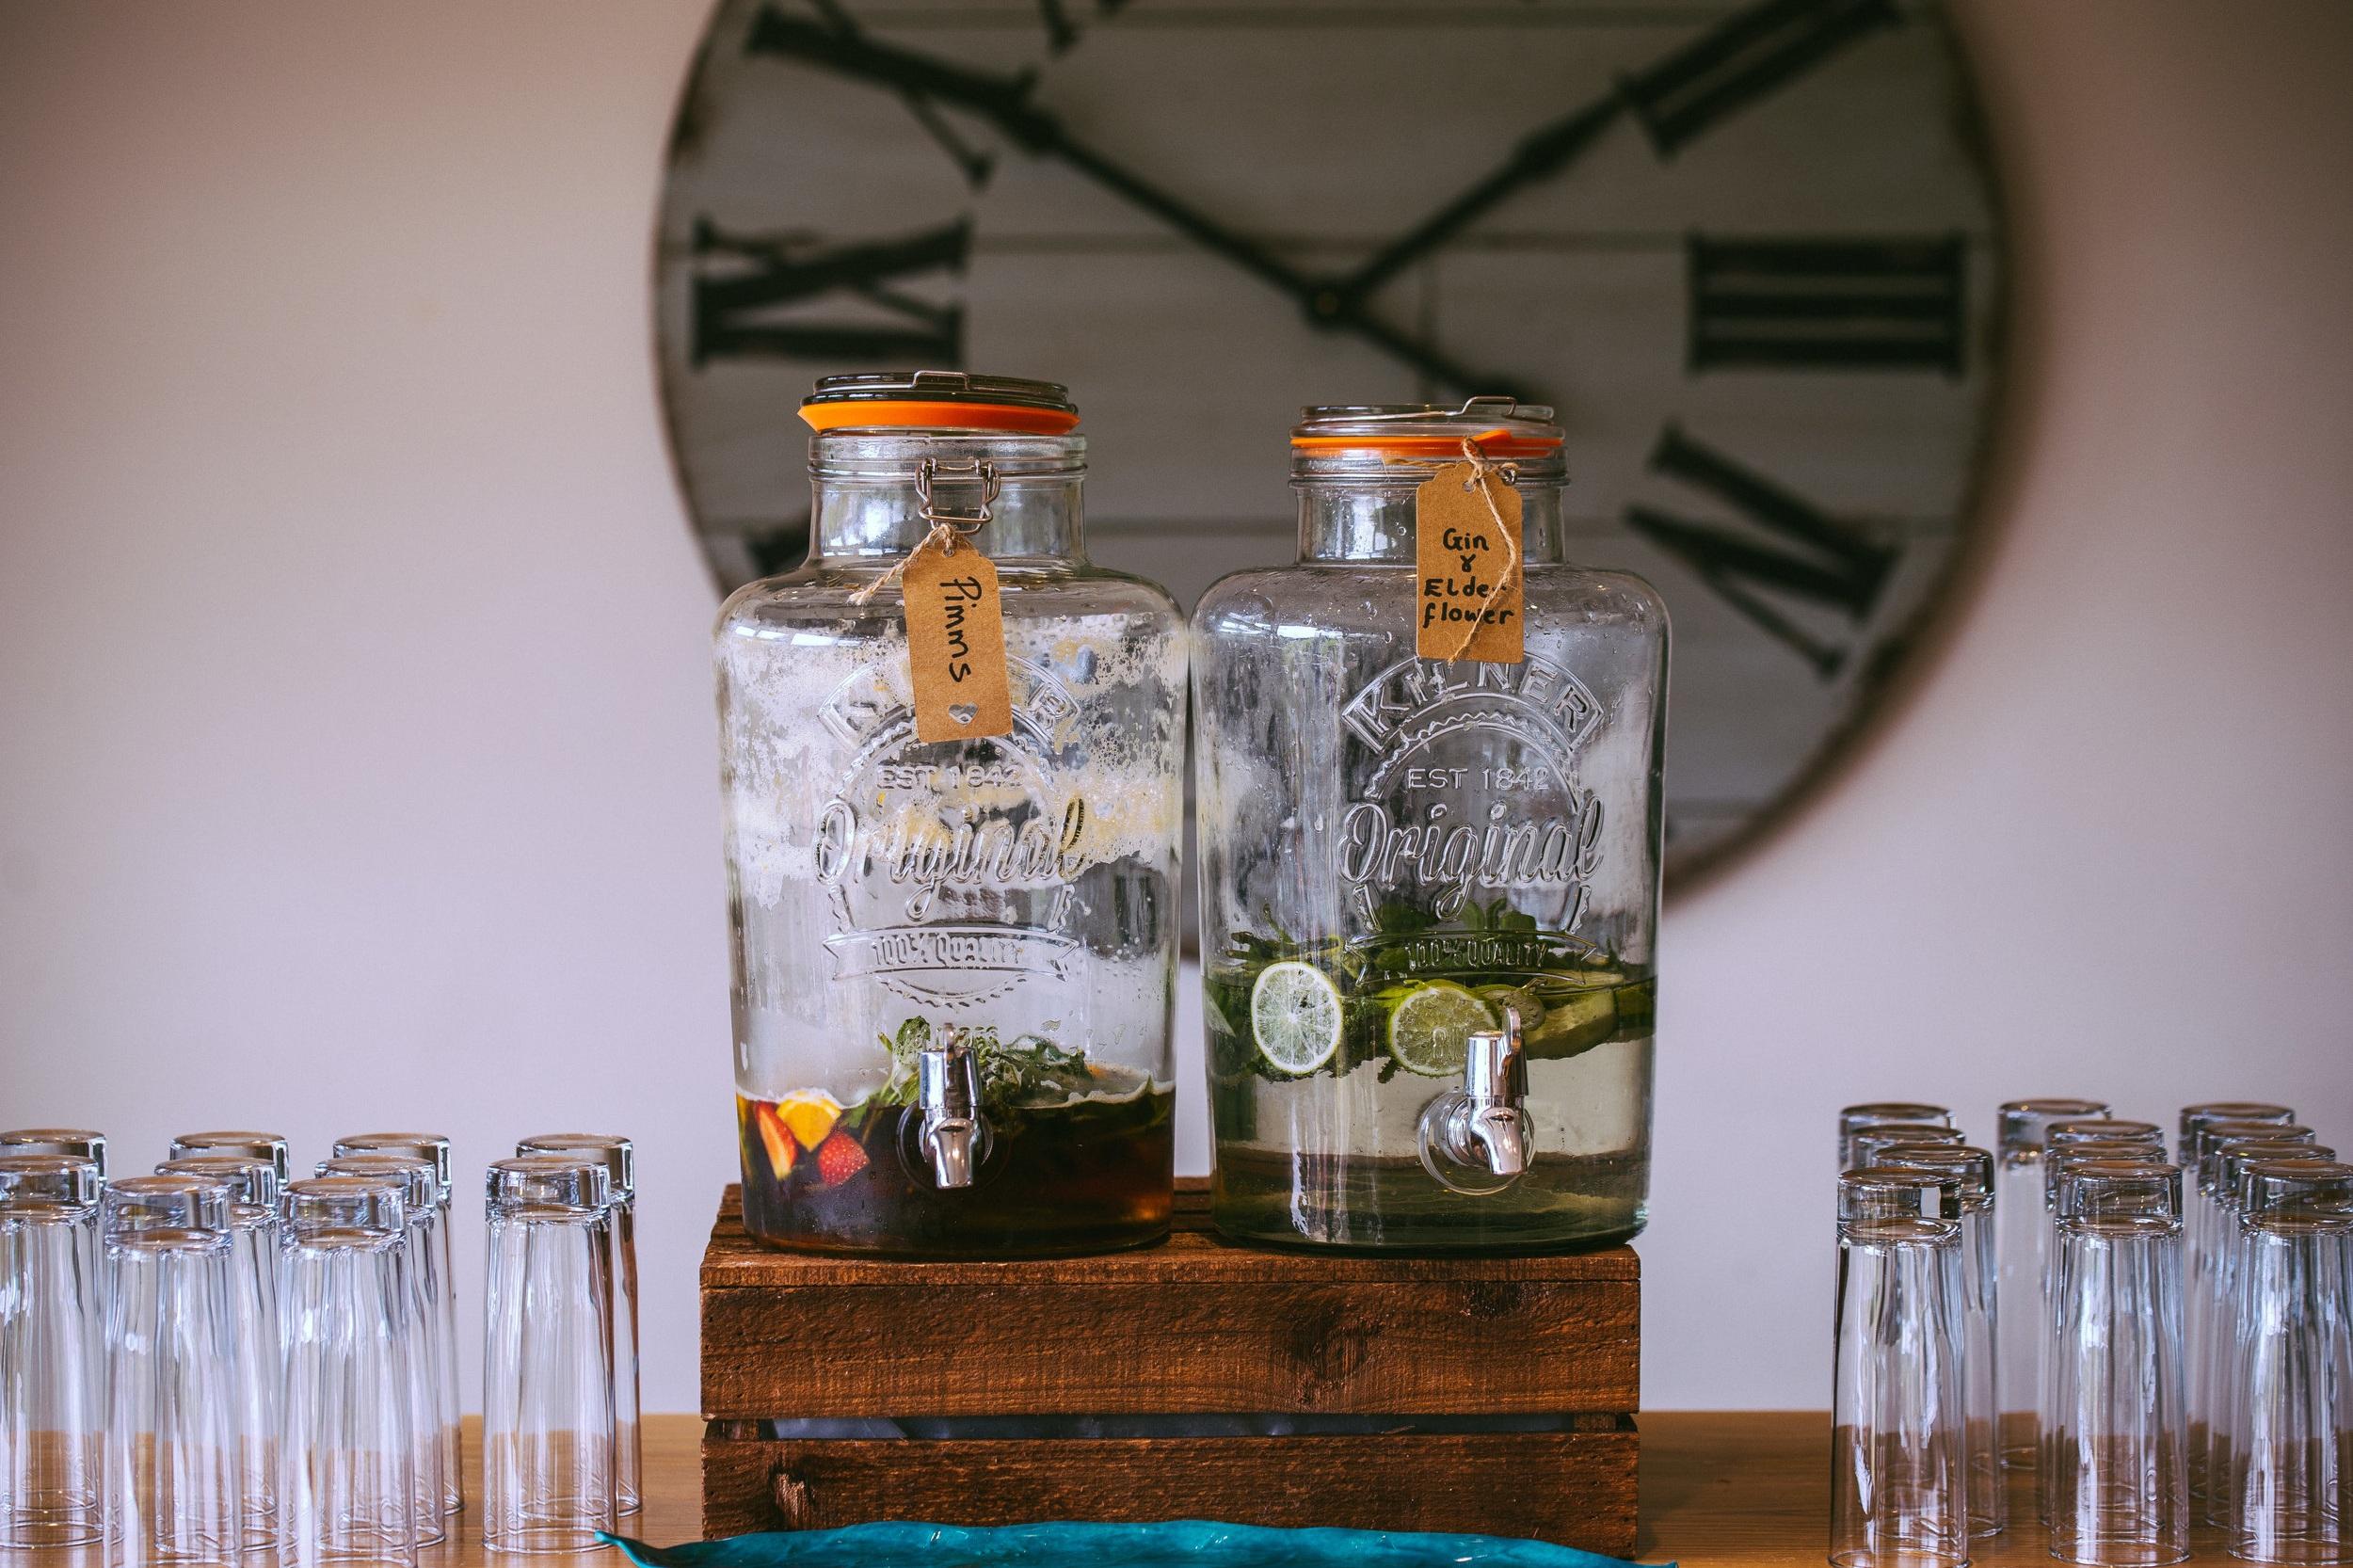 SENSIBLE PACKAGE - sensible alcohol, cocktail mixers, disposables, rentalsstarting at $19 per person